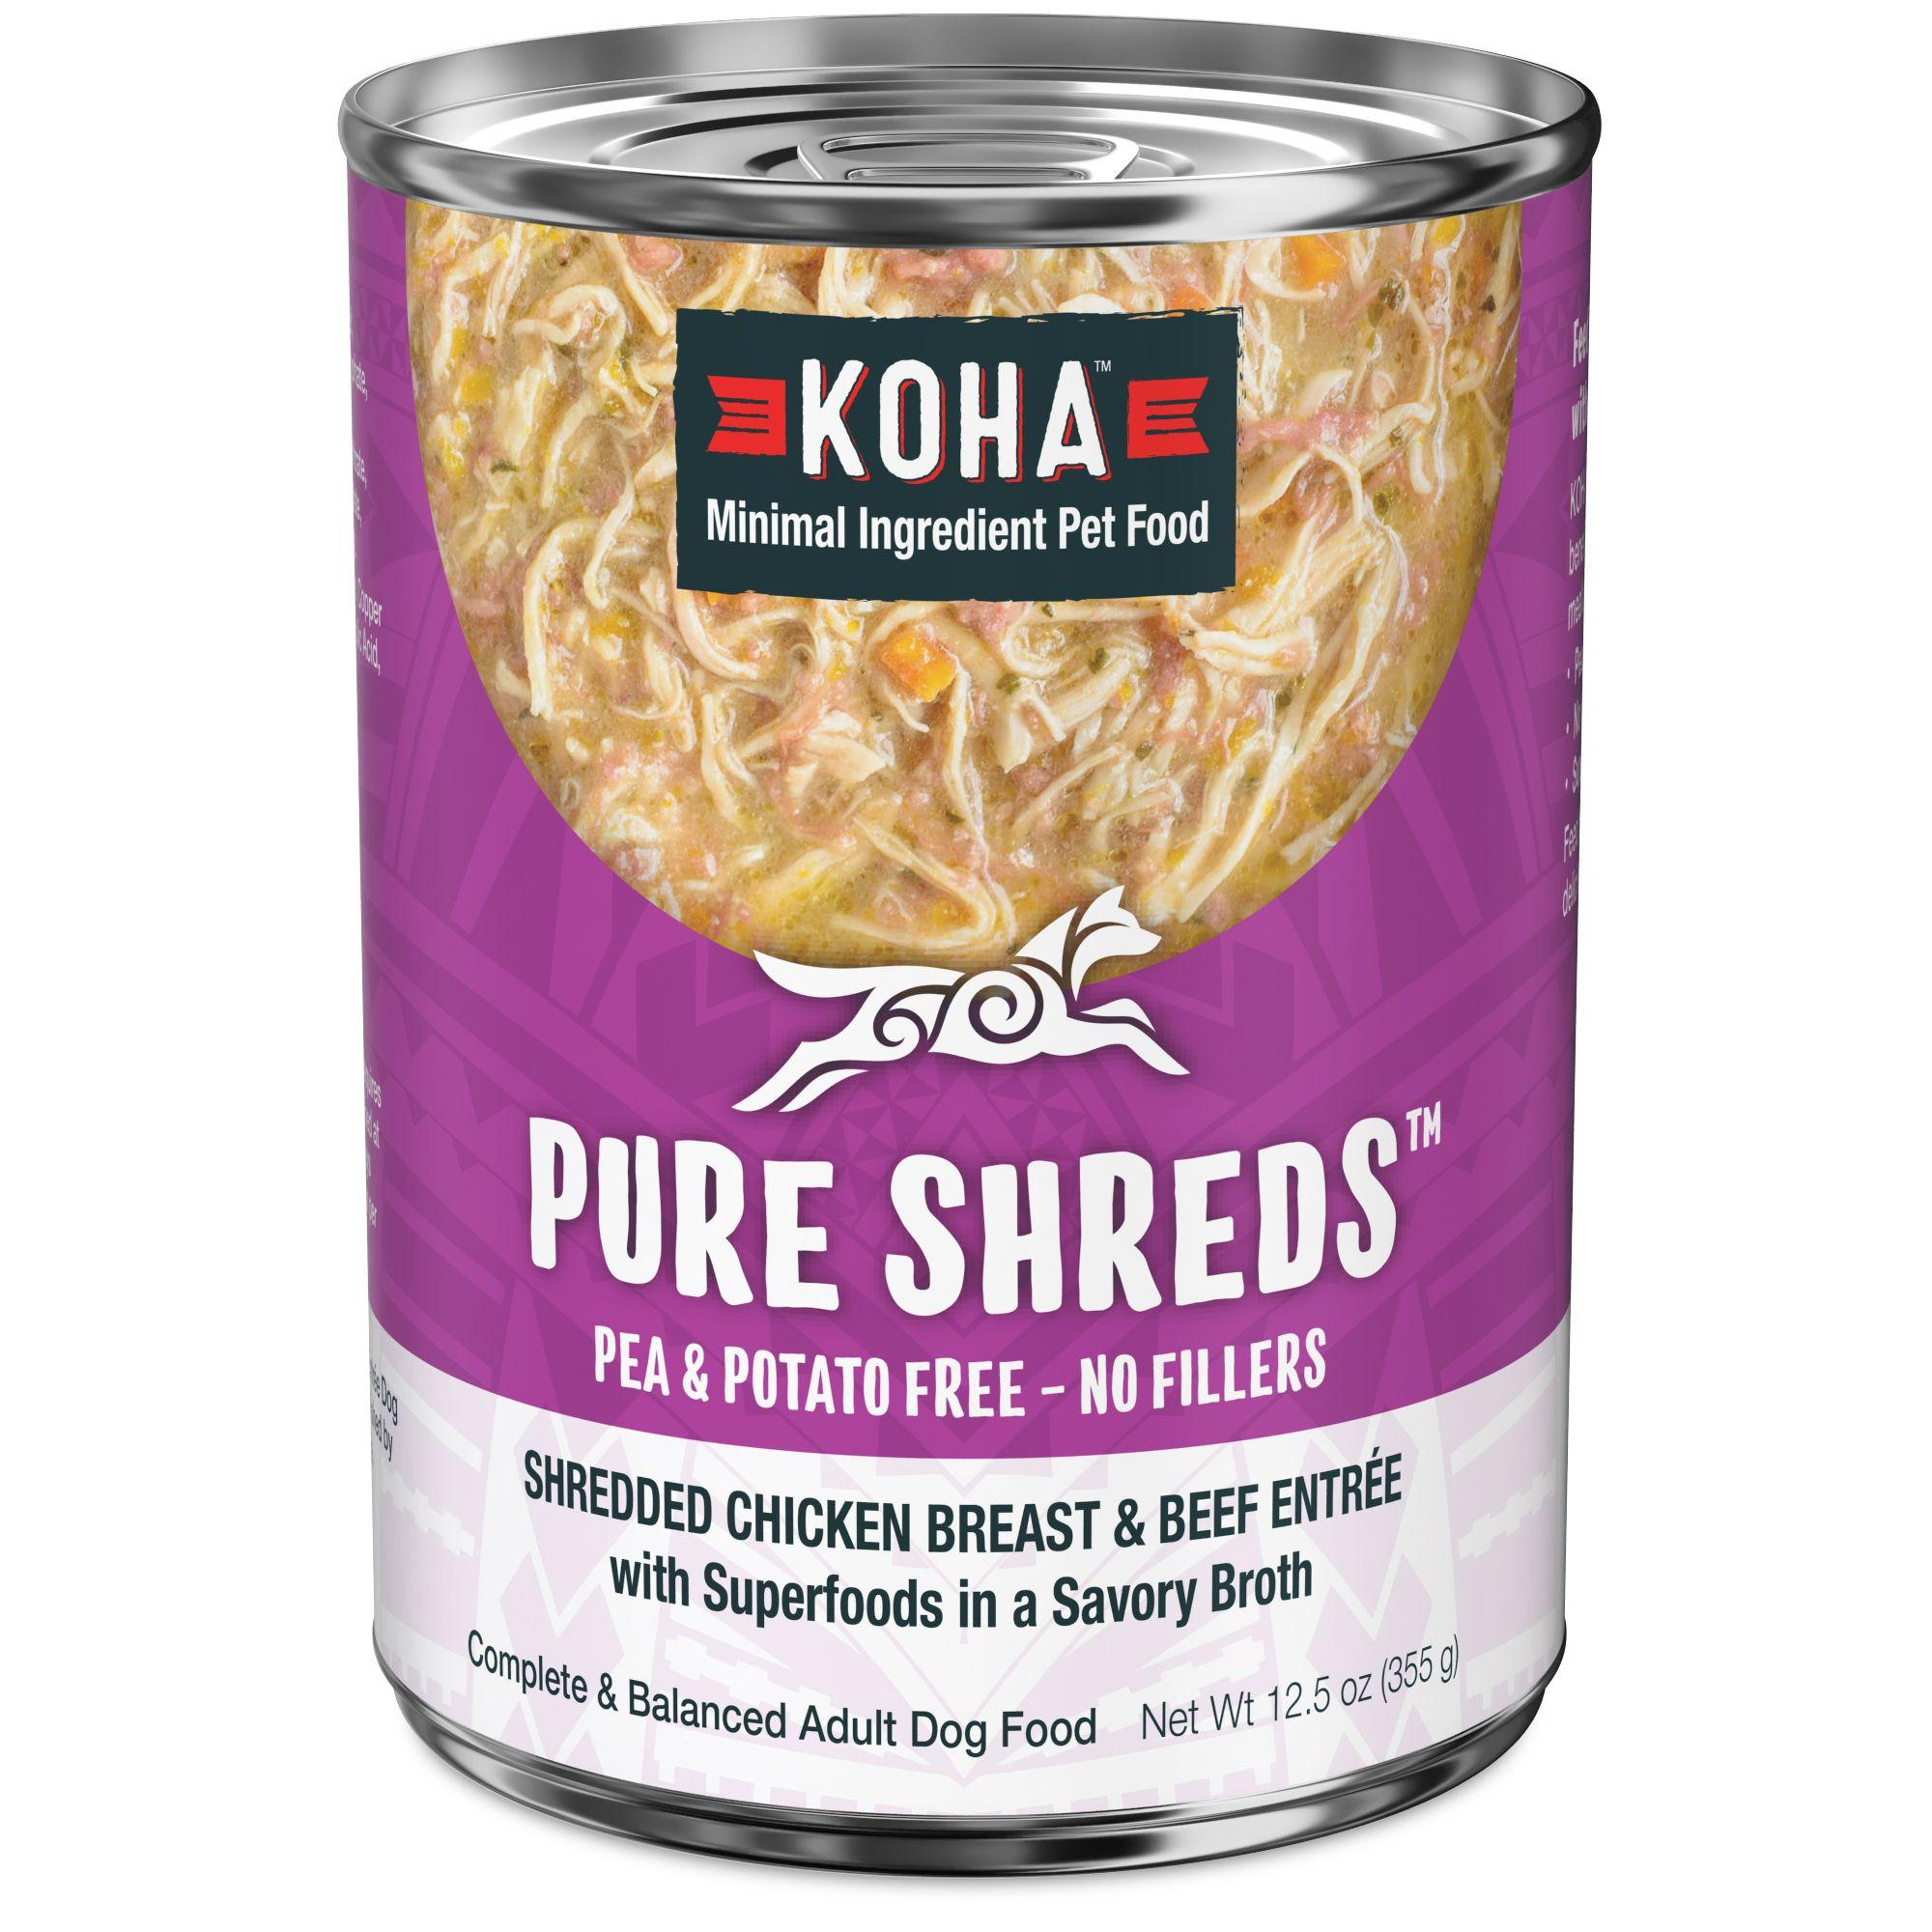 Koha Pure Shreds Shredded Chicken Breast & Beef Entree Canned Dog Food, 12.5-oz